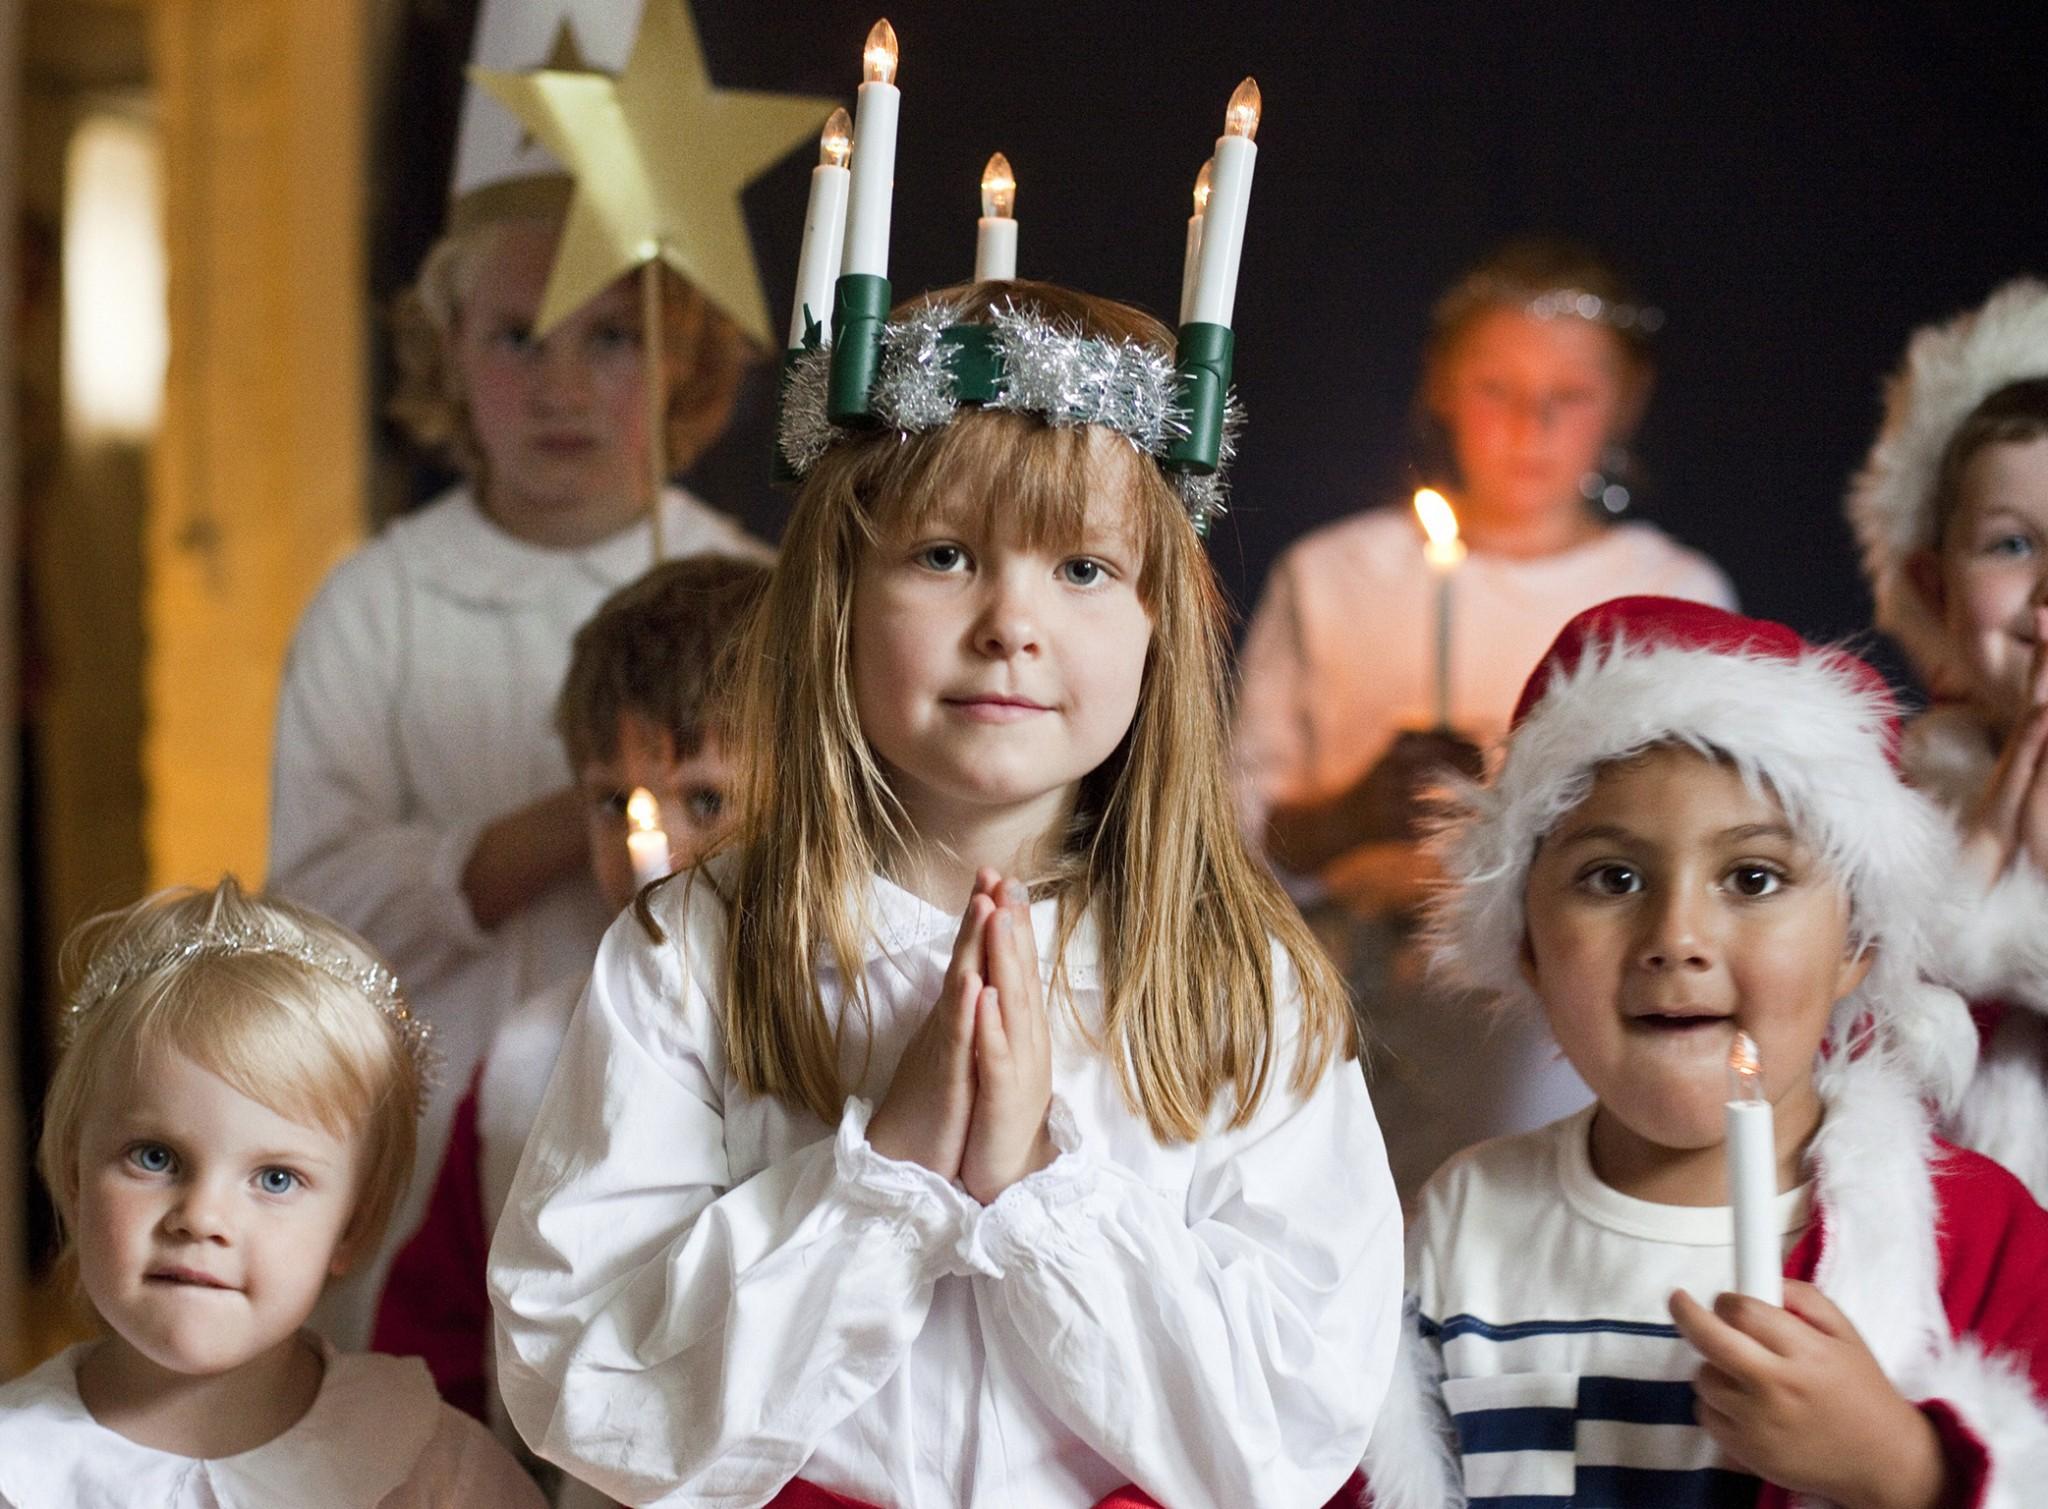 Sænsk börn á Lúsíuhátíð. Mynd af Sweden.se – https://sweden.se/culture-traditions/lucia/